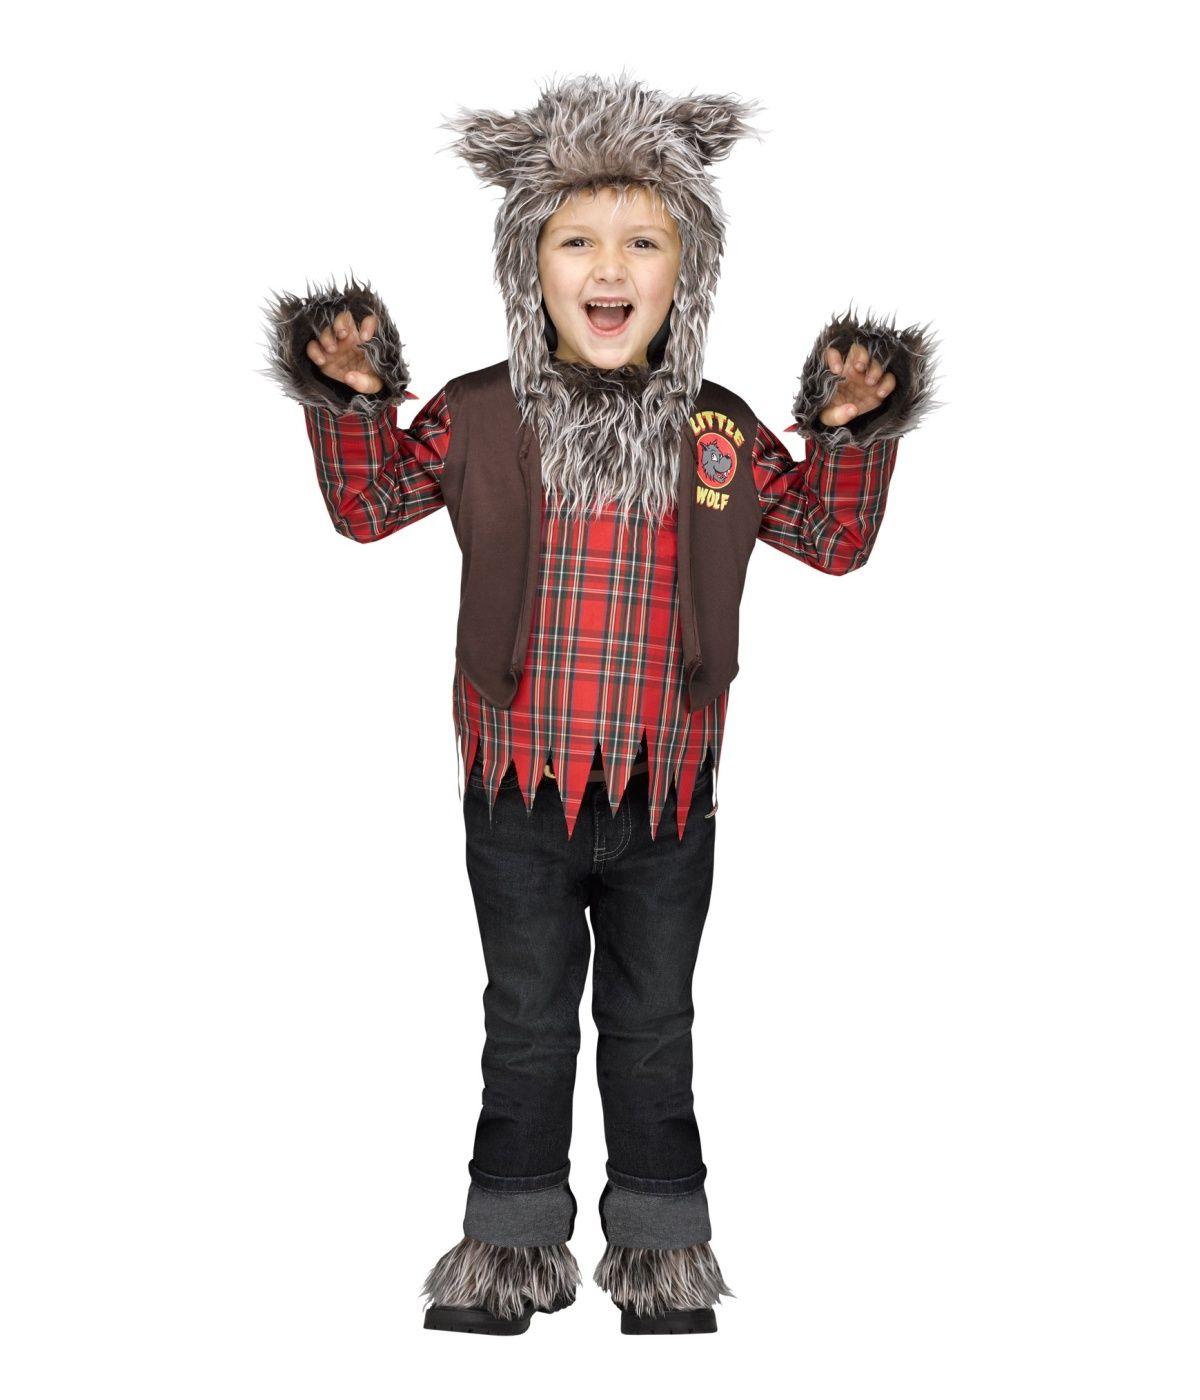 Little Boys Wolf Halloween Werewolf Costume Small (4?6)  sc 1 st  Pinterest & Little Boys Wolf Halloween Werewolf Costume Small (4?6) | Spencer ...